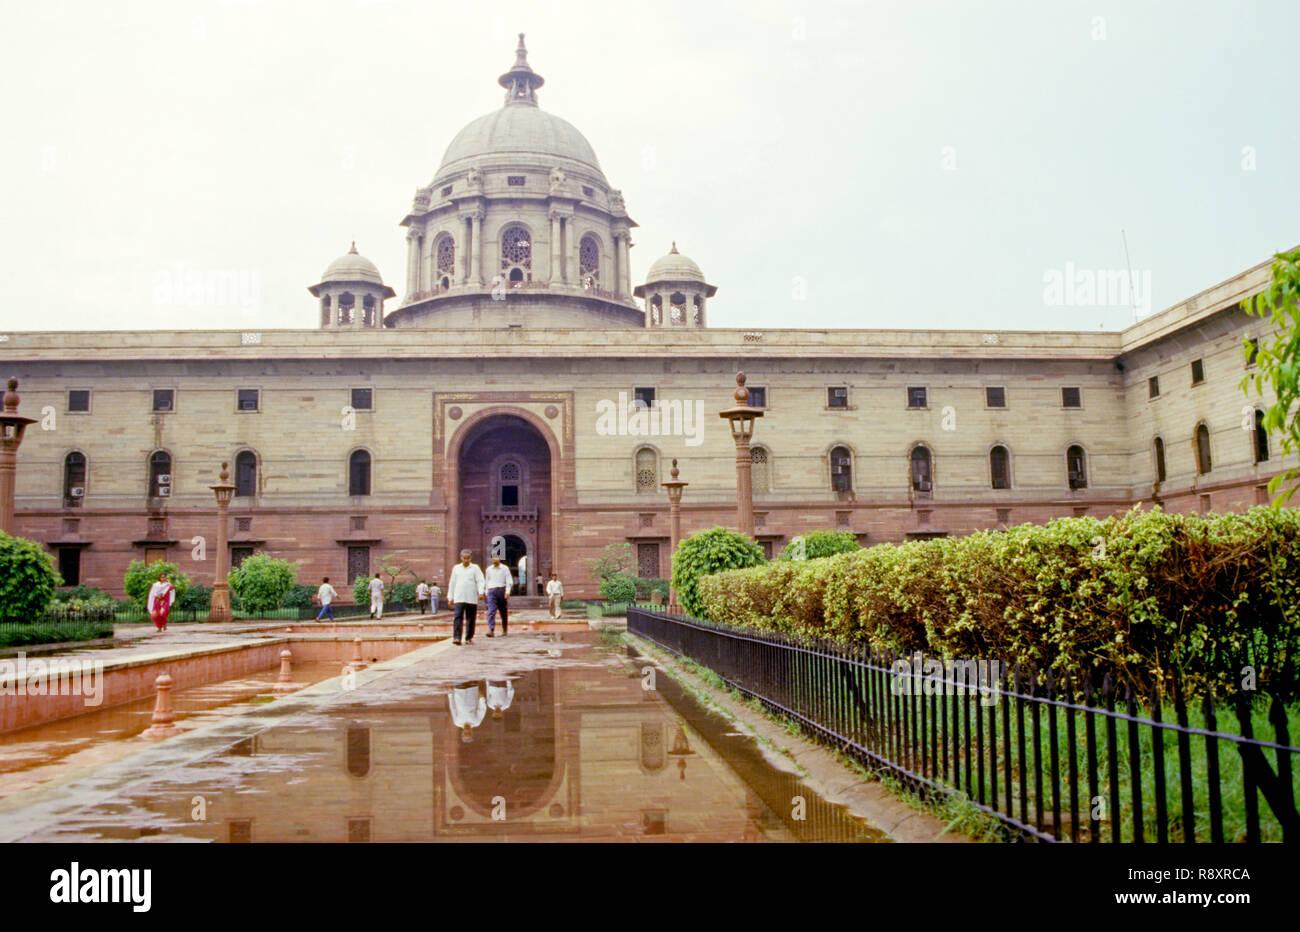 South Block, New Delhi, India - Stock Image